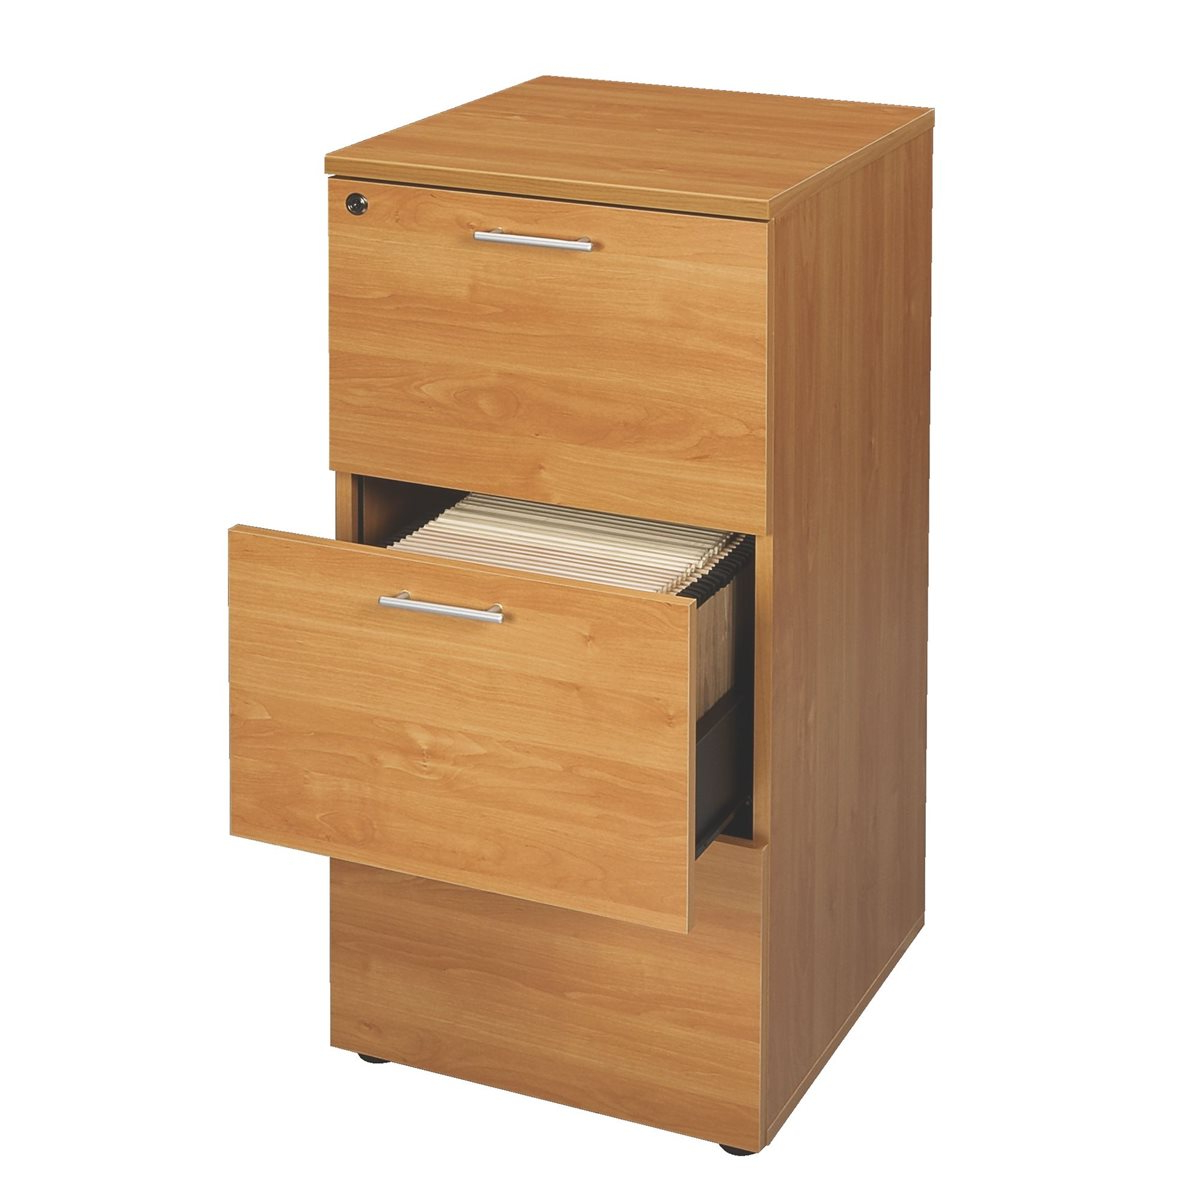 Mueble Archivador Carpetas Colgantes 3ldq Archivador Madera 3 Cajones Para Carpetas Colgantes Archivadores